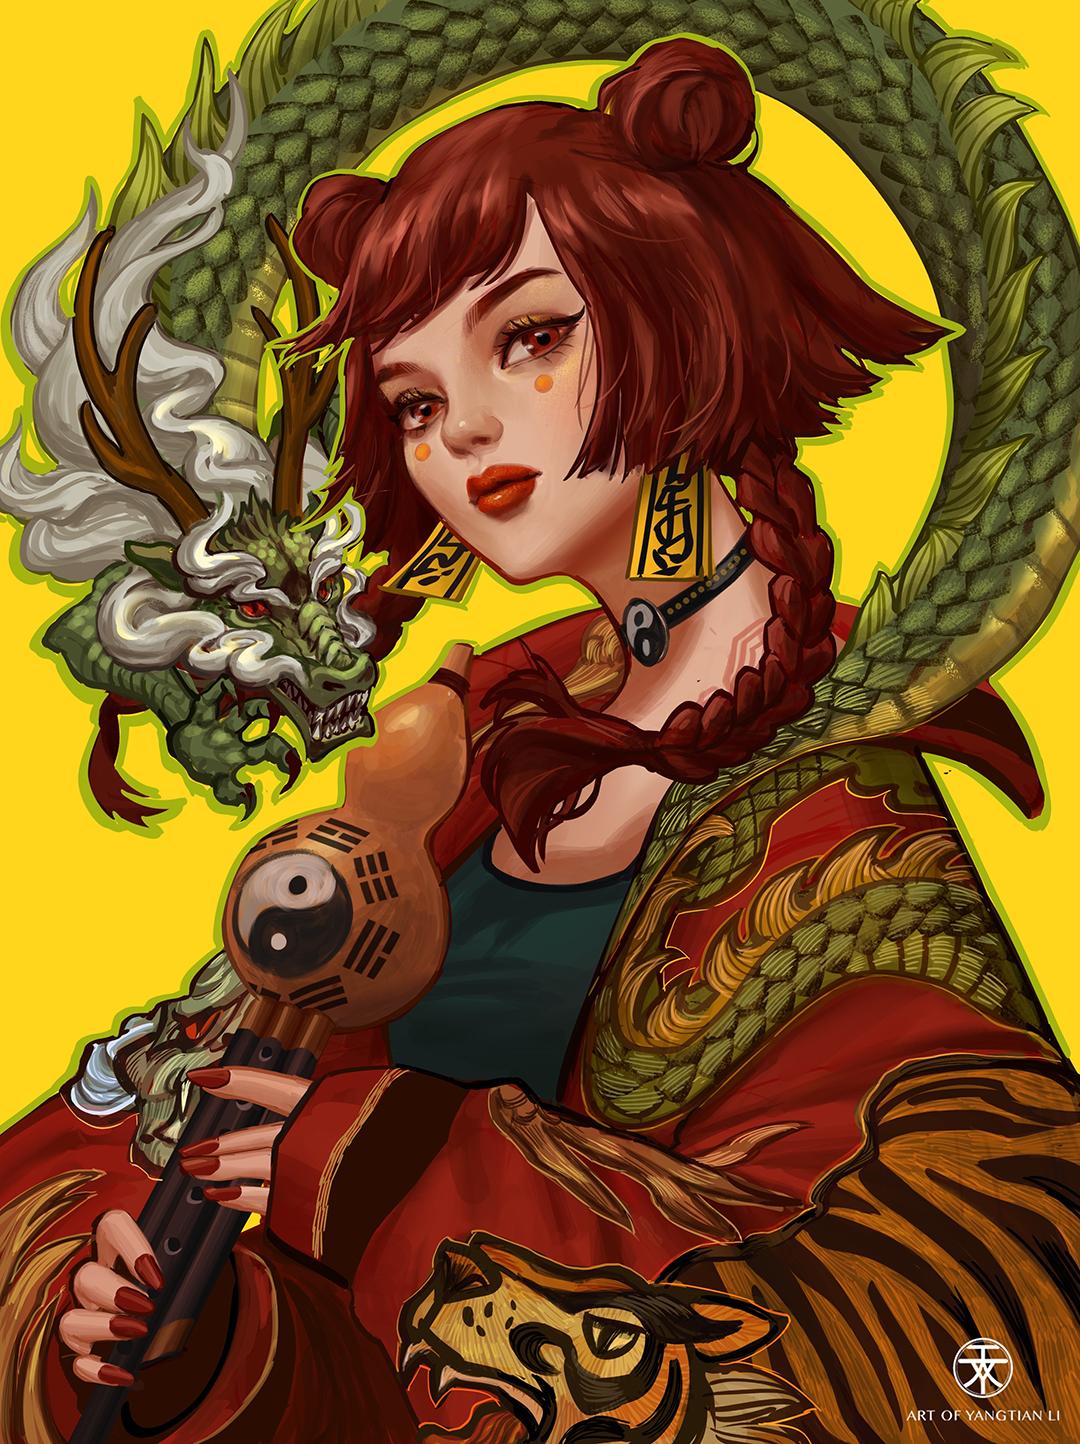 GirlsclubAsia-Artist-yangtian-li-asset